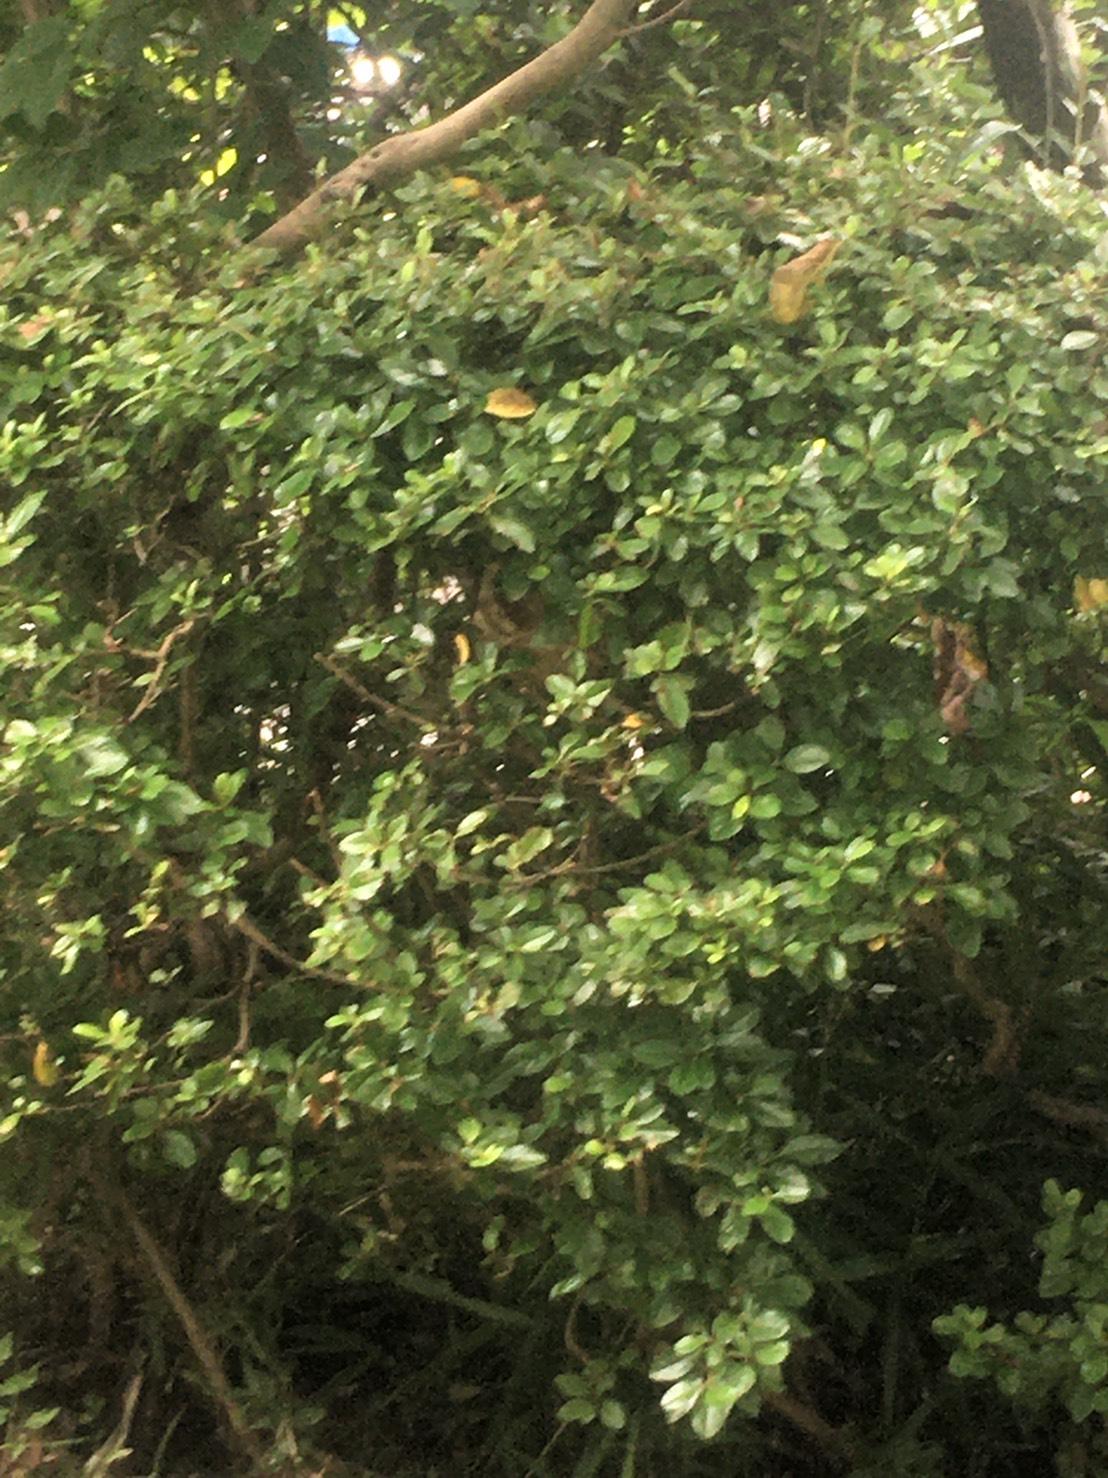 千葉県我孫子市天王台の蜂の巣駆除現場